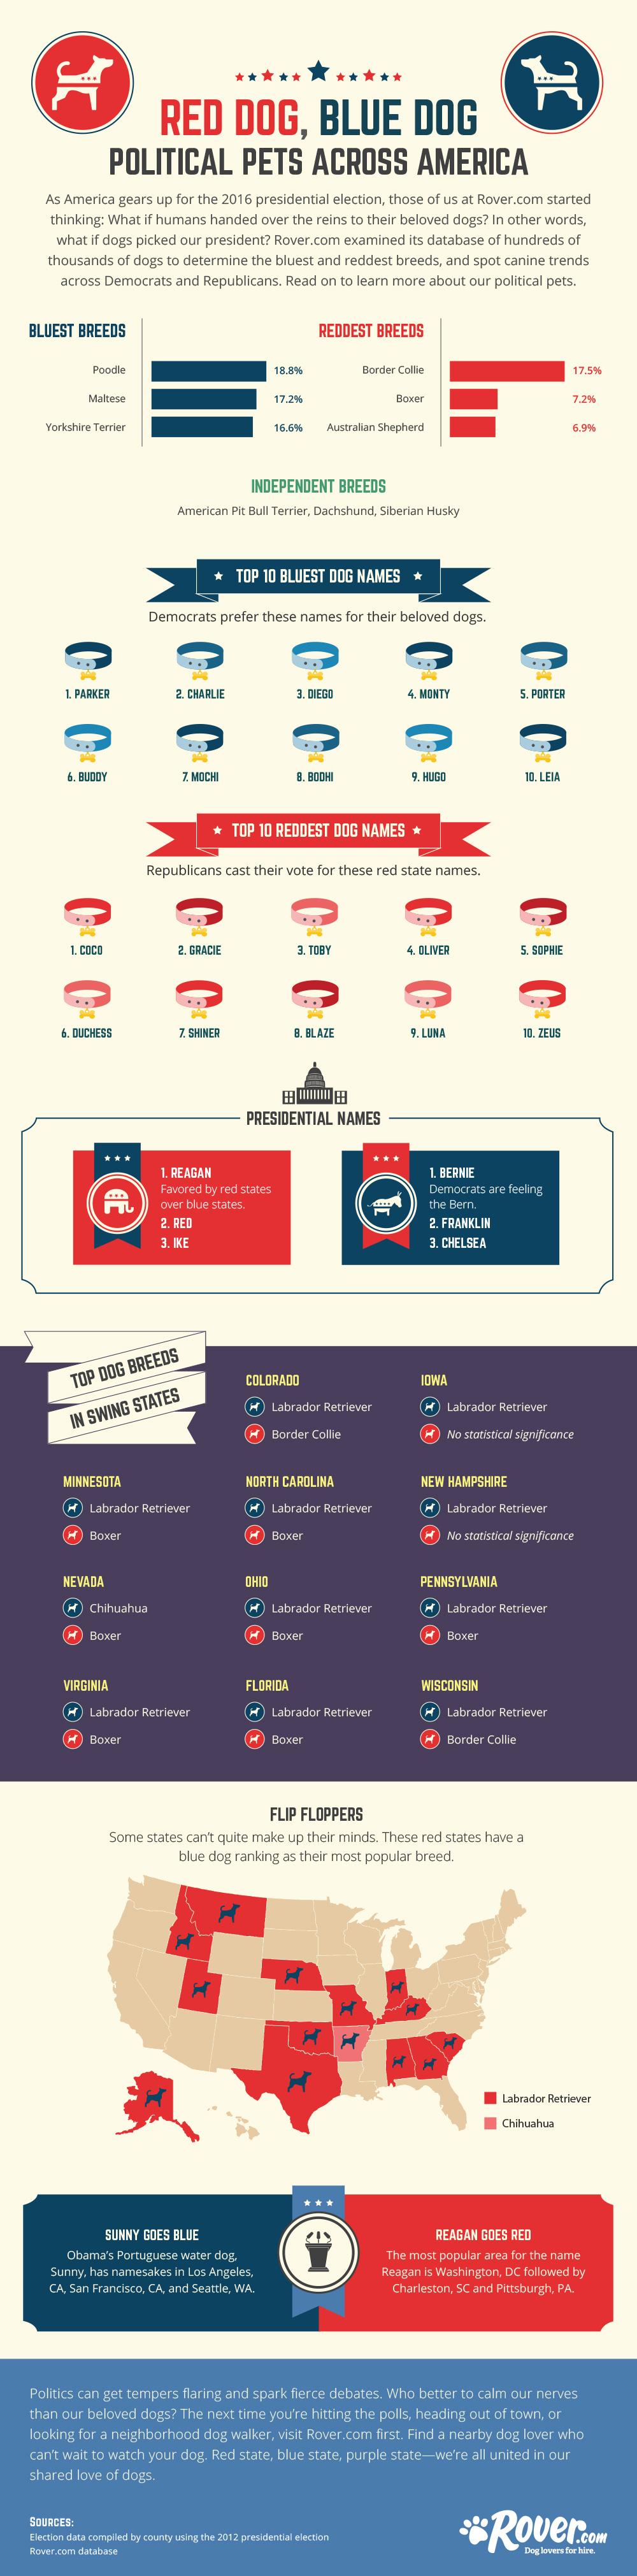 https://www.rover.com/blog/wp-content/uploads/2015/11/Political_Infographic_Final.jpg